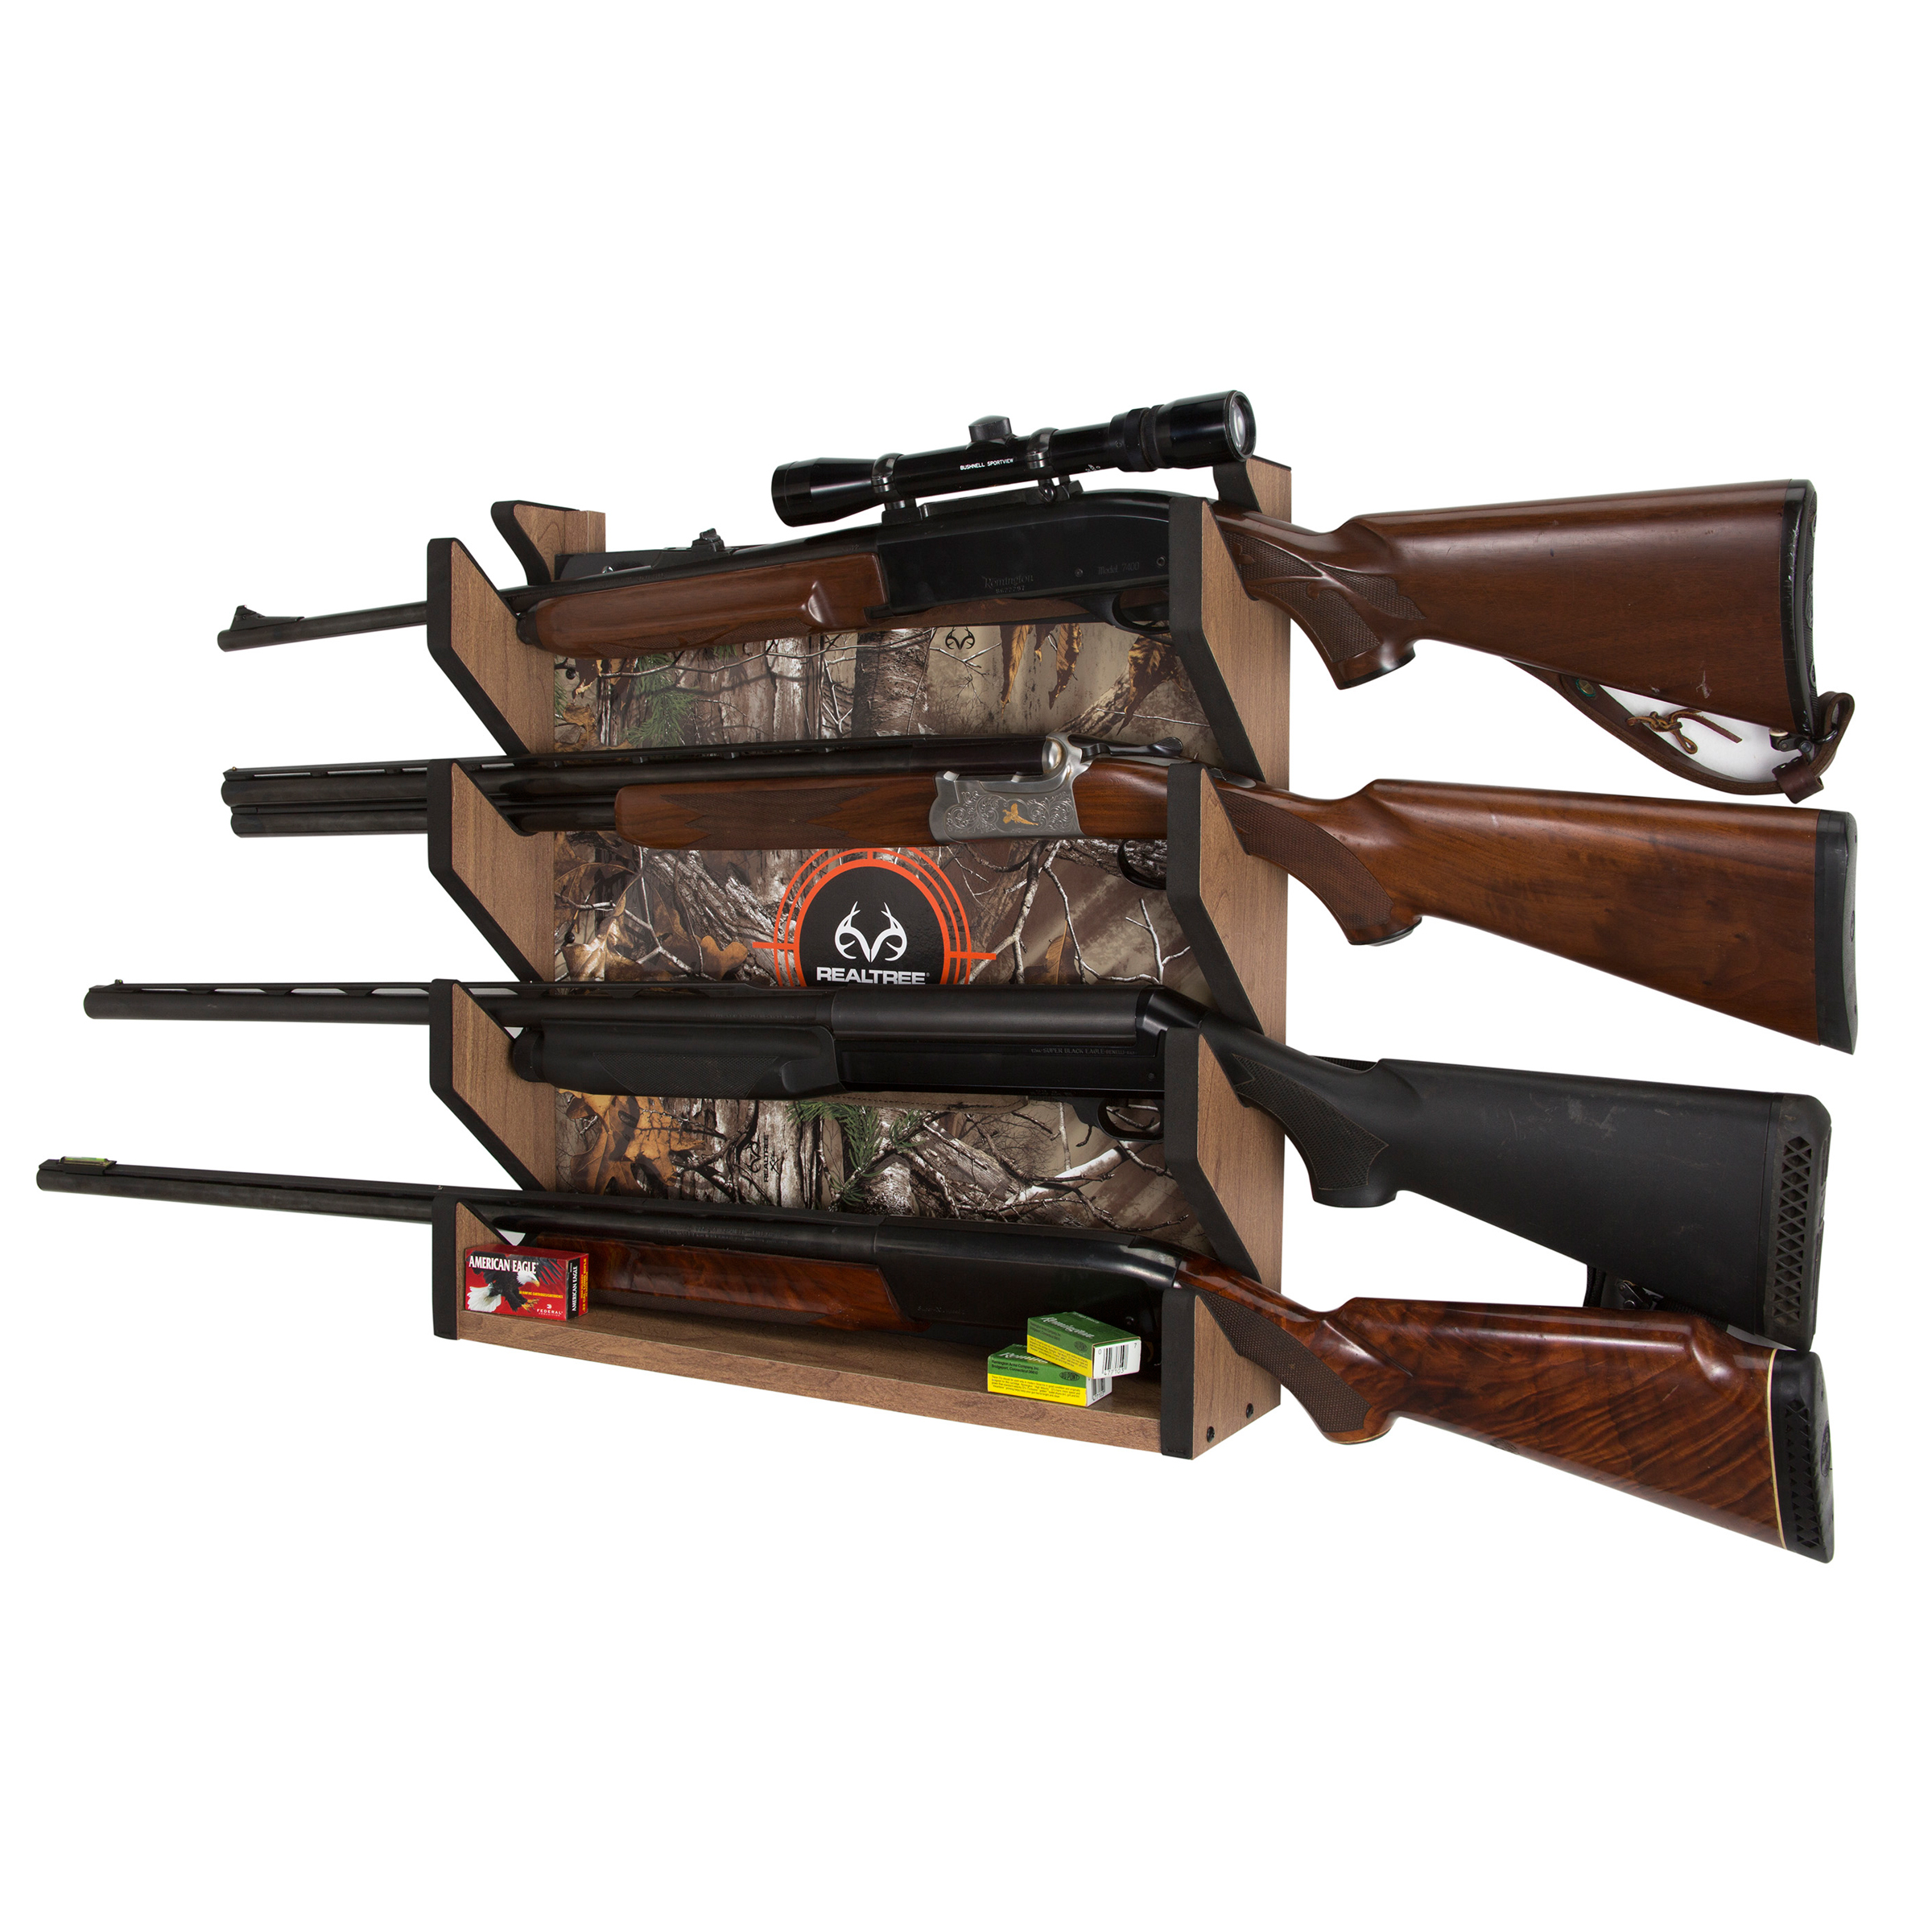 gun racks rifle racks gunsafes com